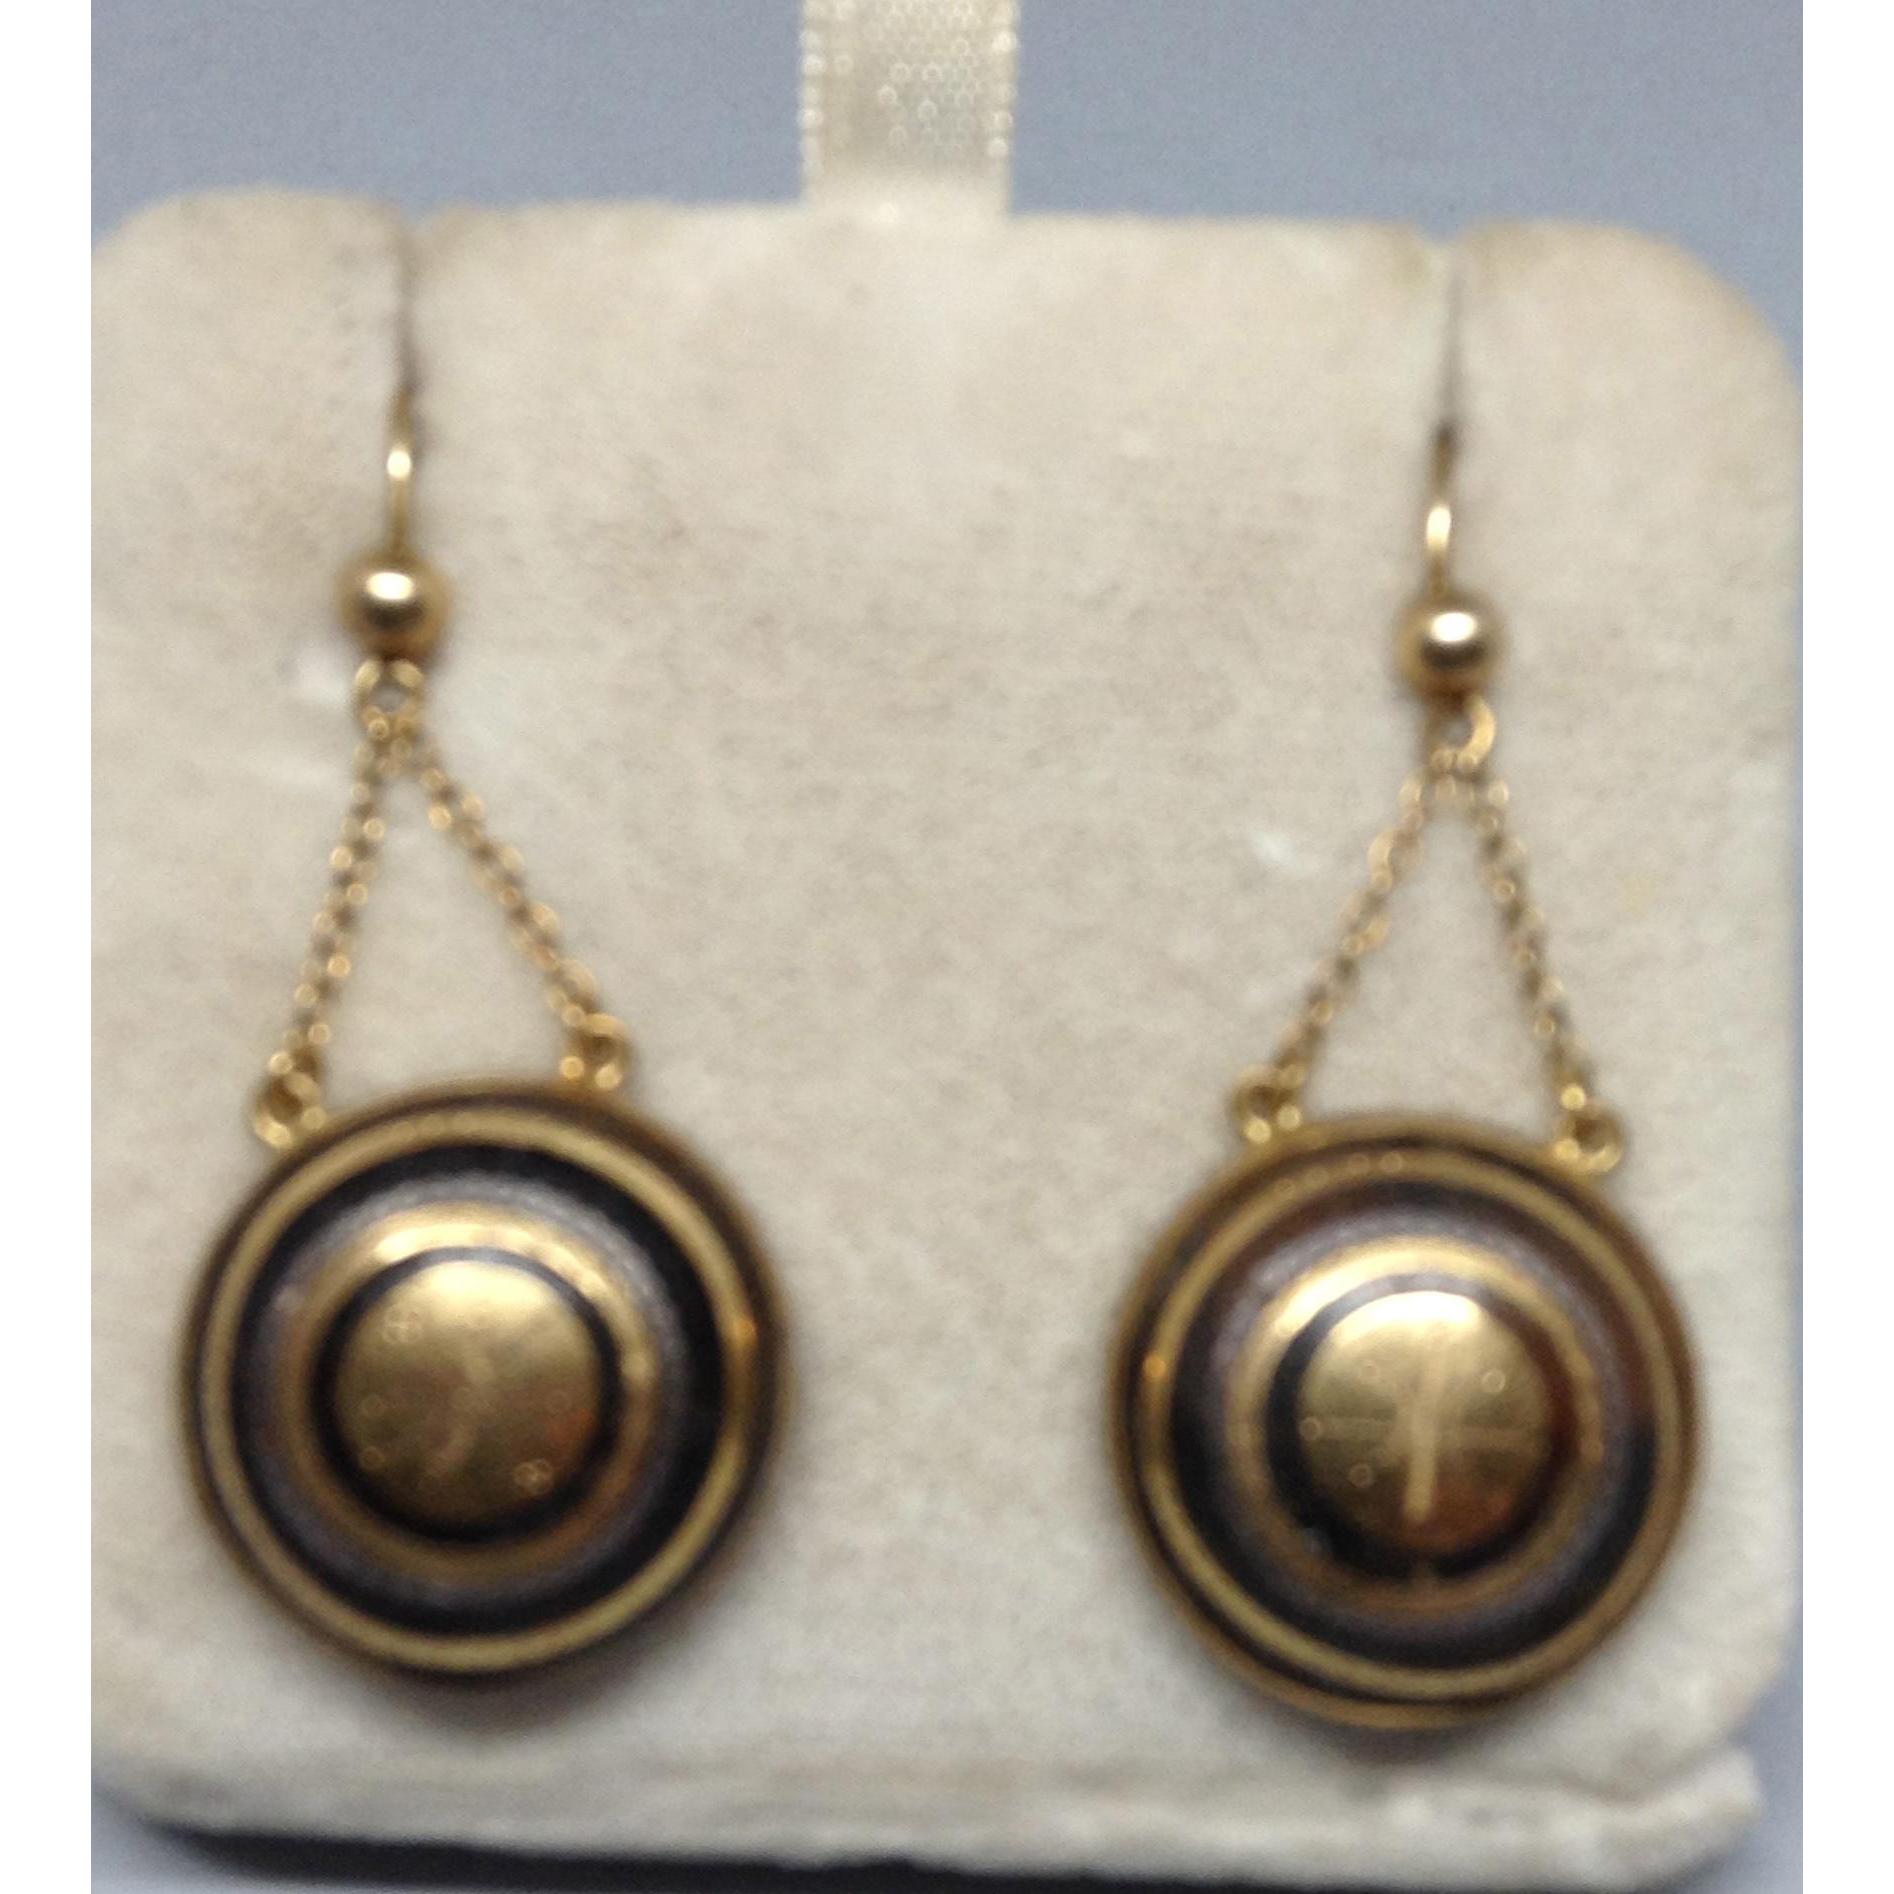 Victorian Exquisite Pique/Gold Earrings